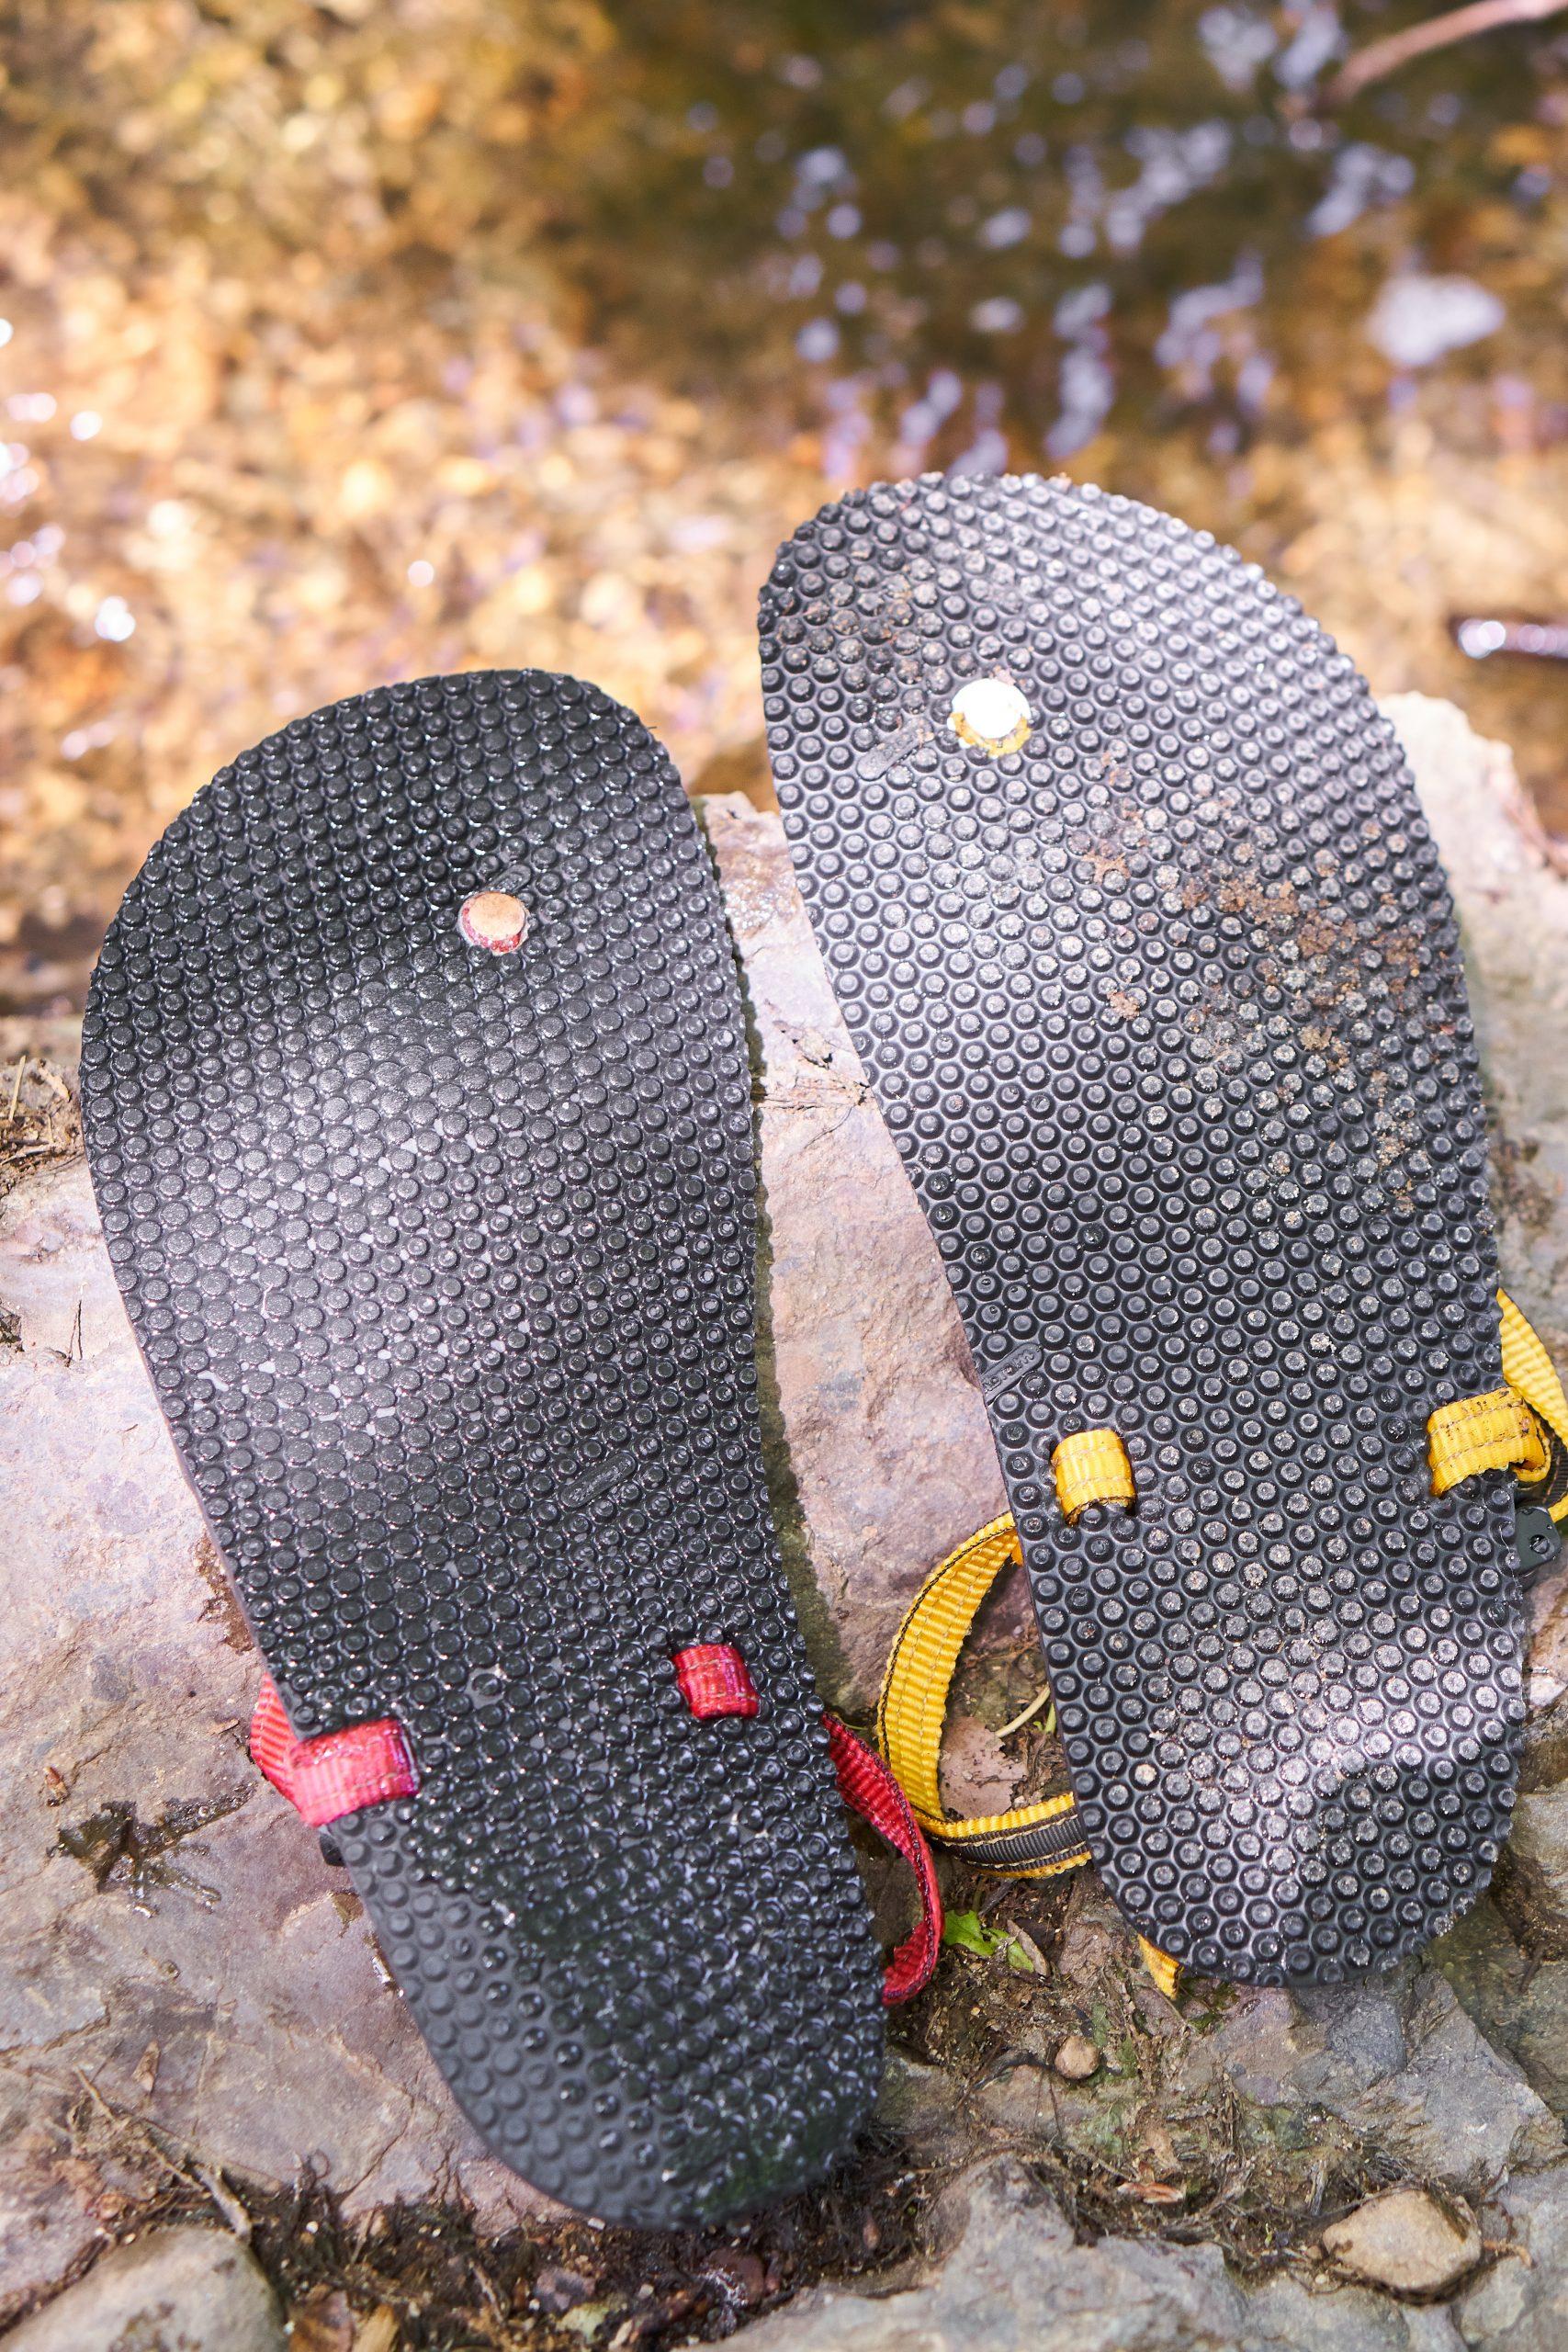 The Vibram Gumlite sole is versatile and has good groundfeel